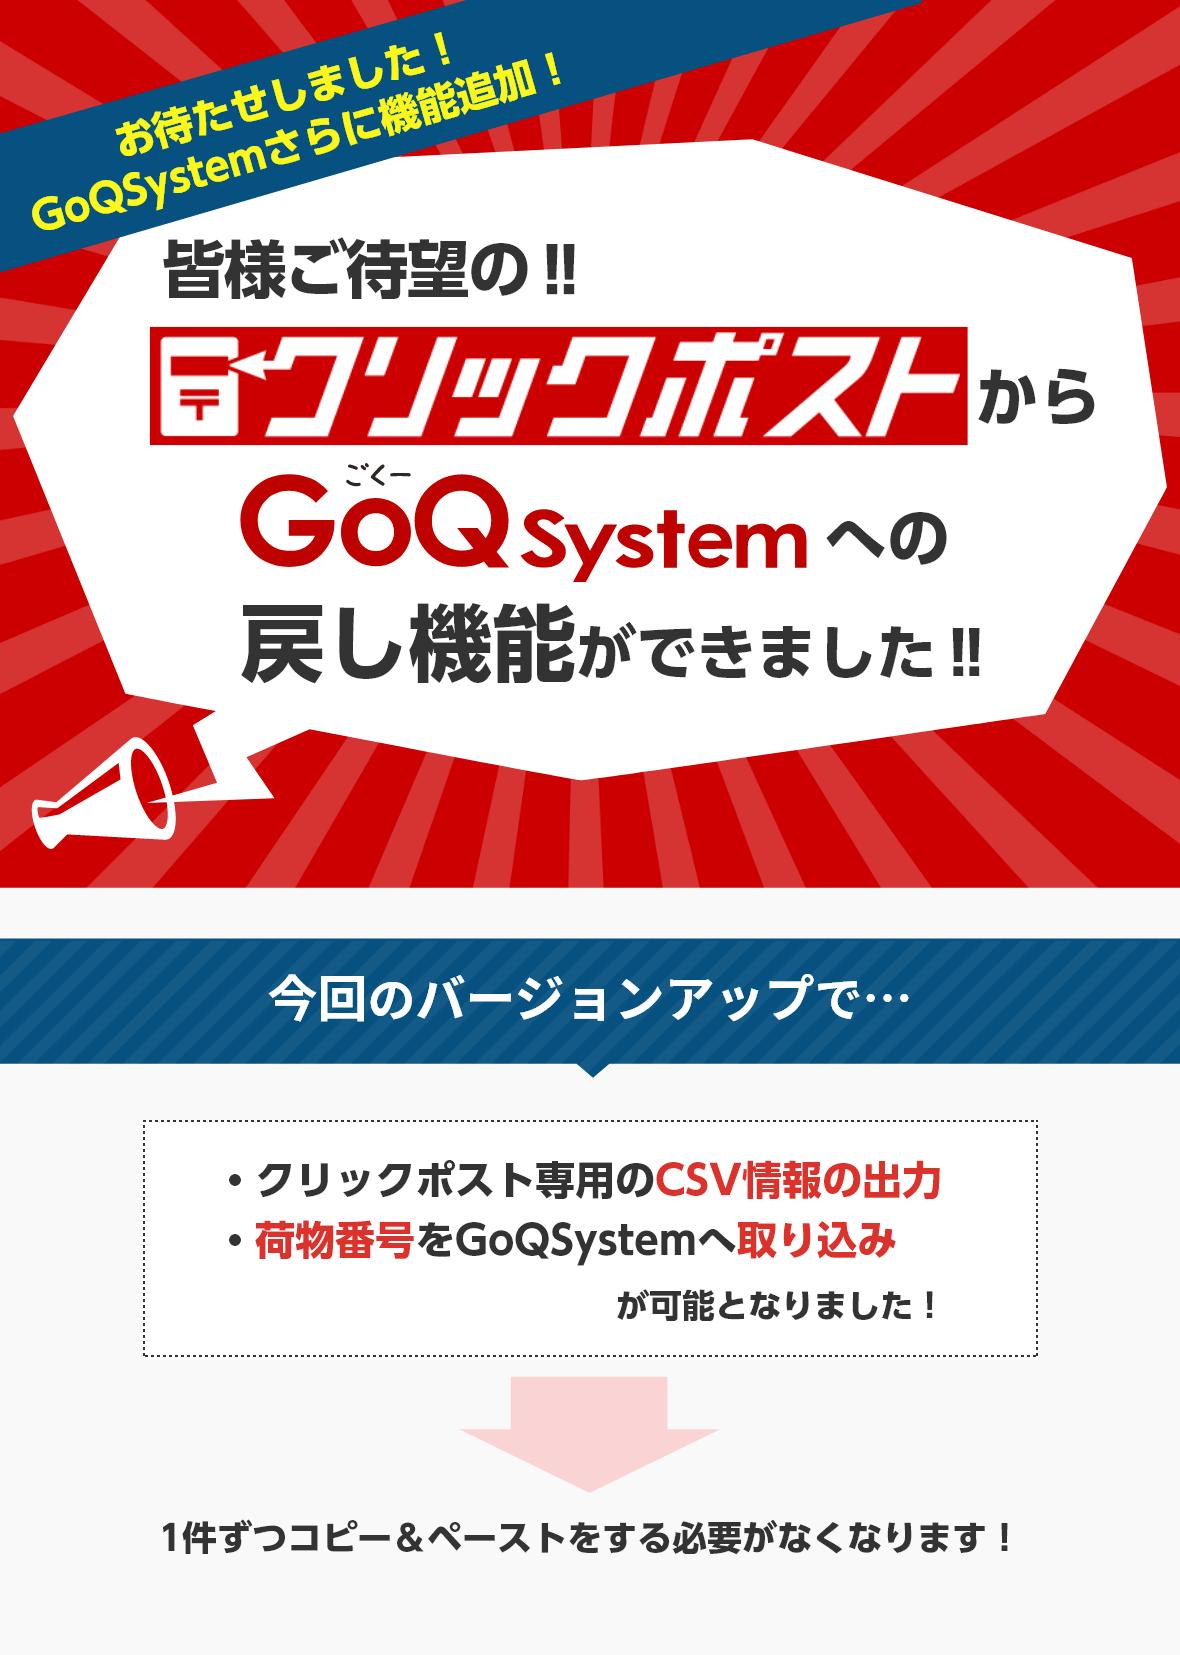 GoQSystemさらに新機能!